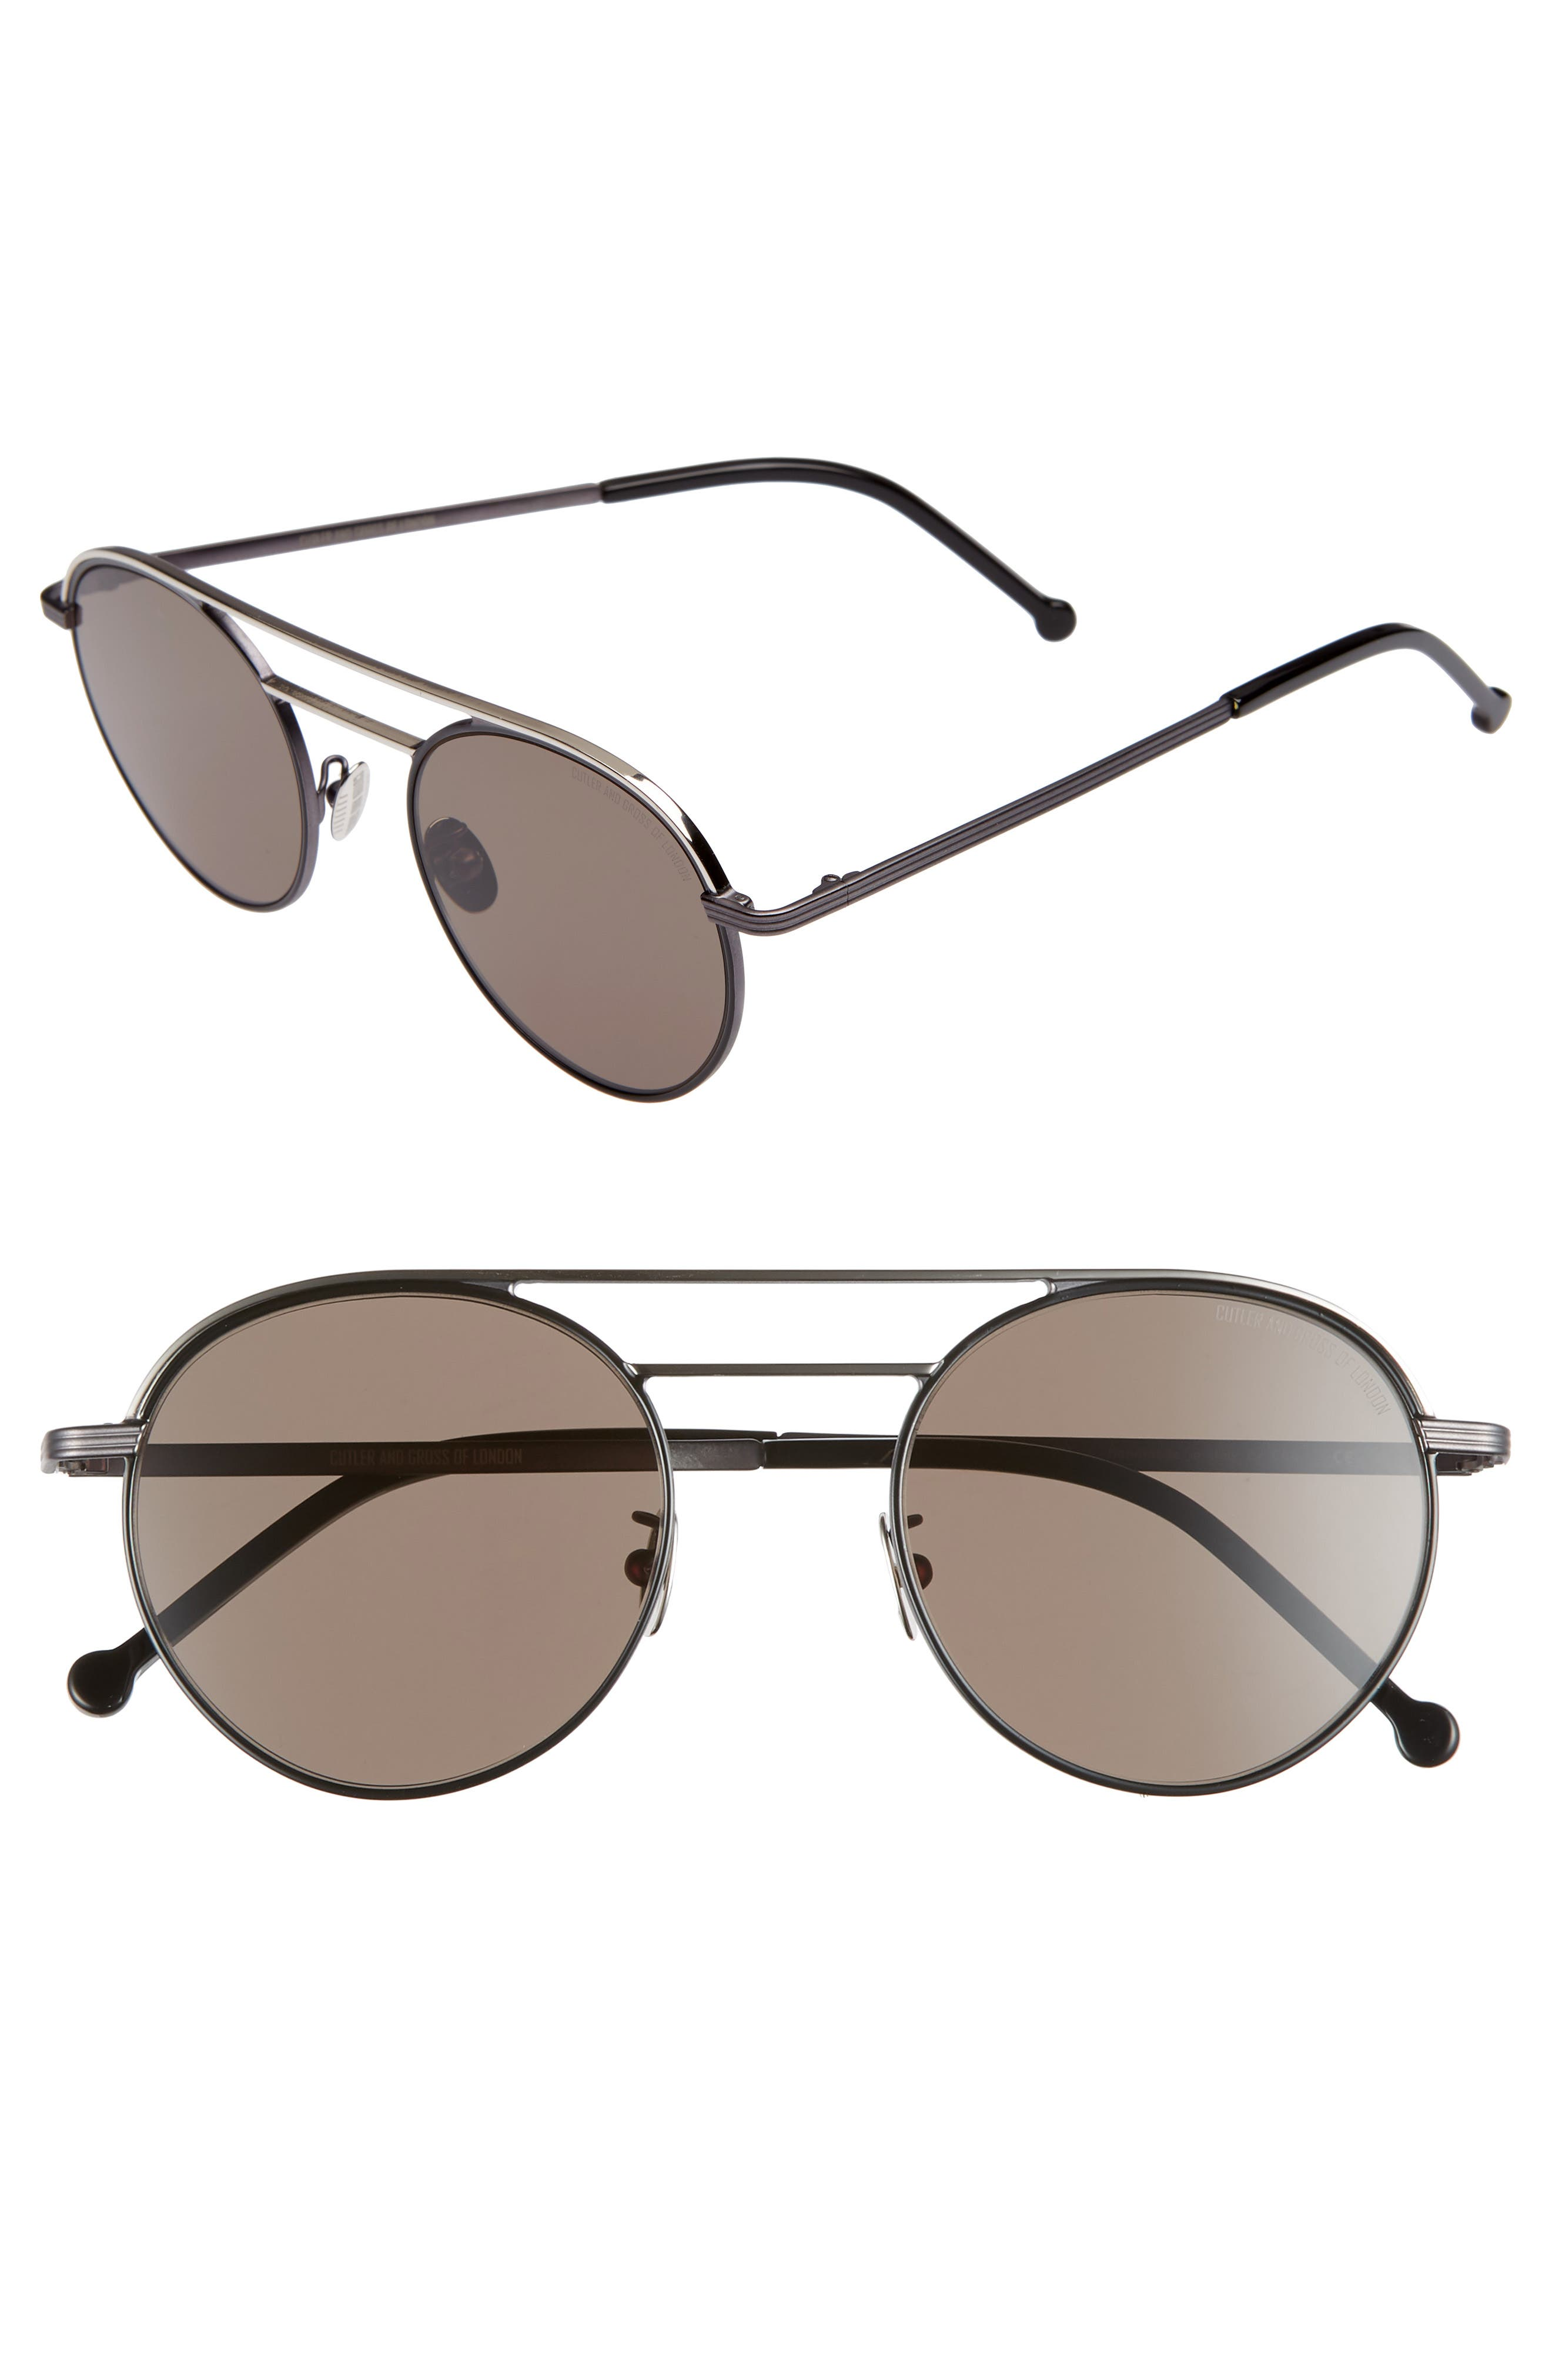 50mm Polarized Round Sunglasses,                         Main,                         color, BLACK/ BLACK